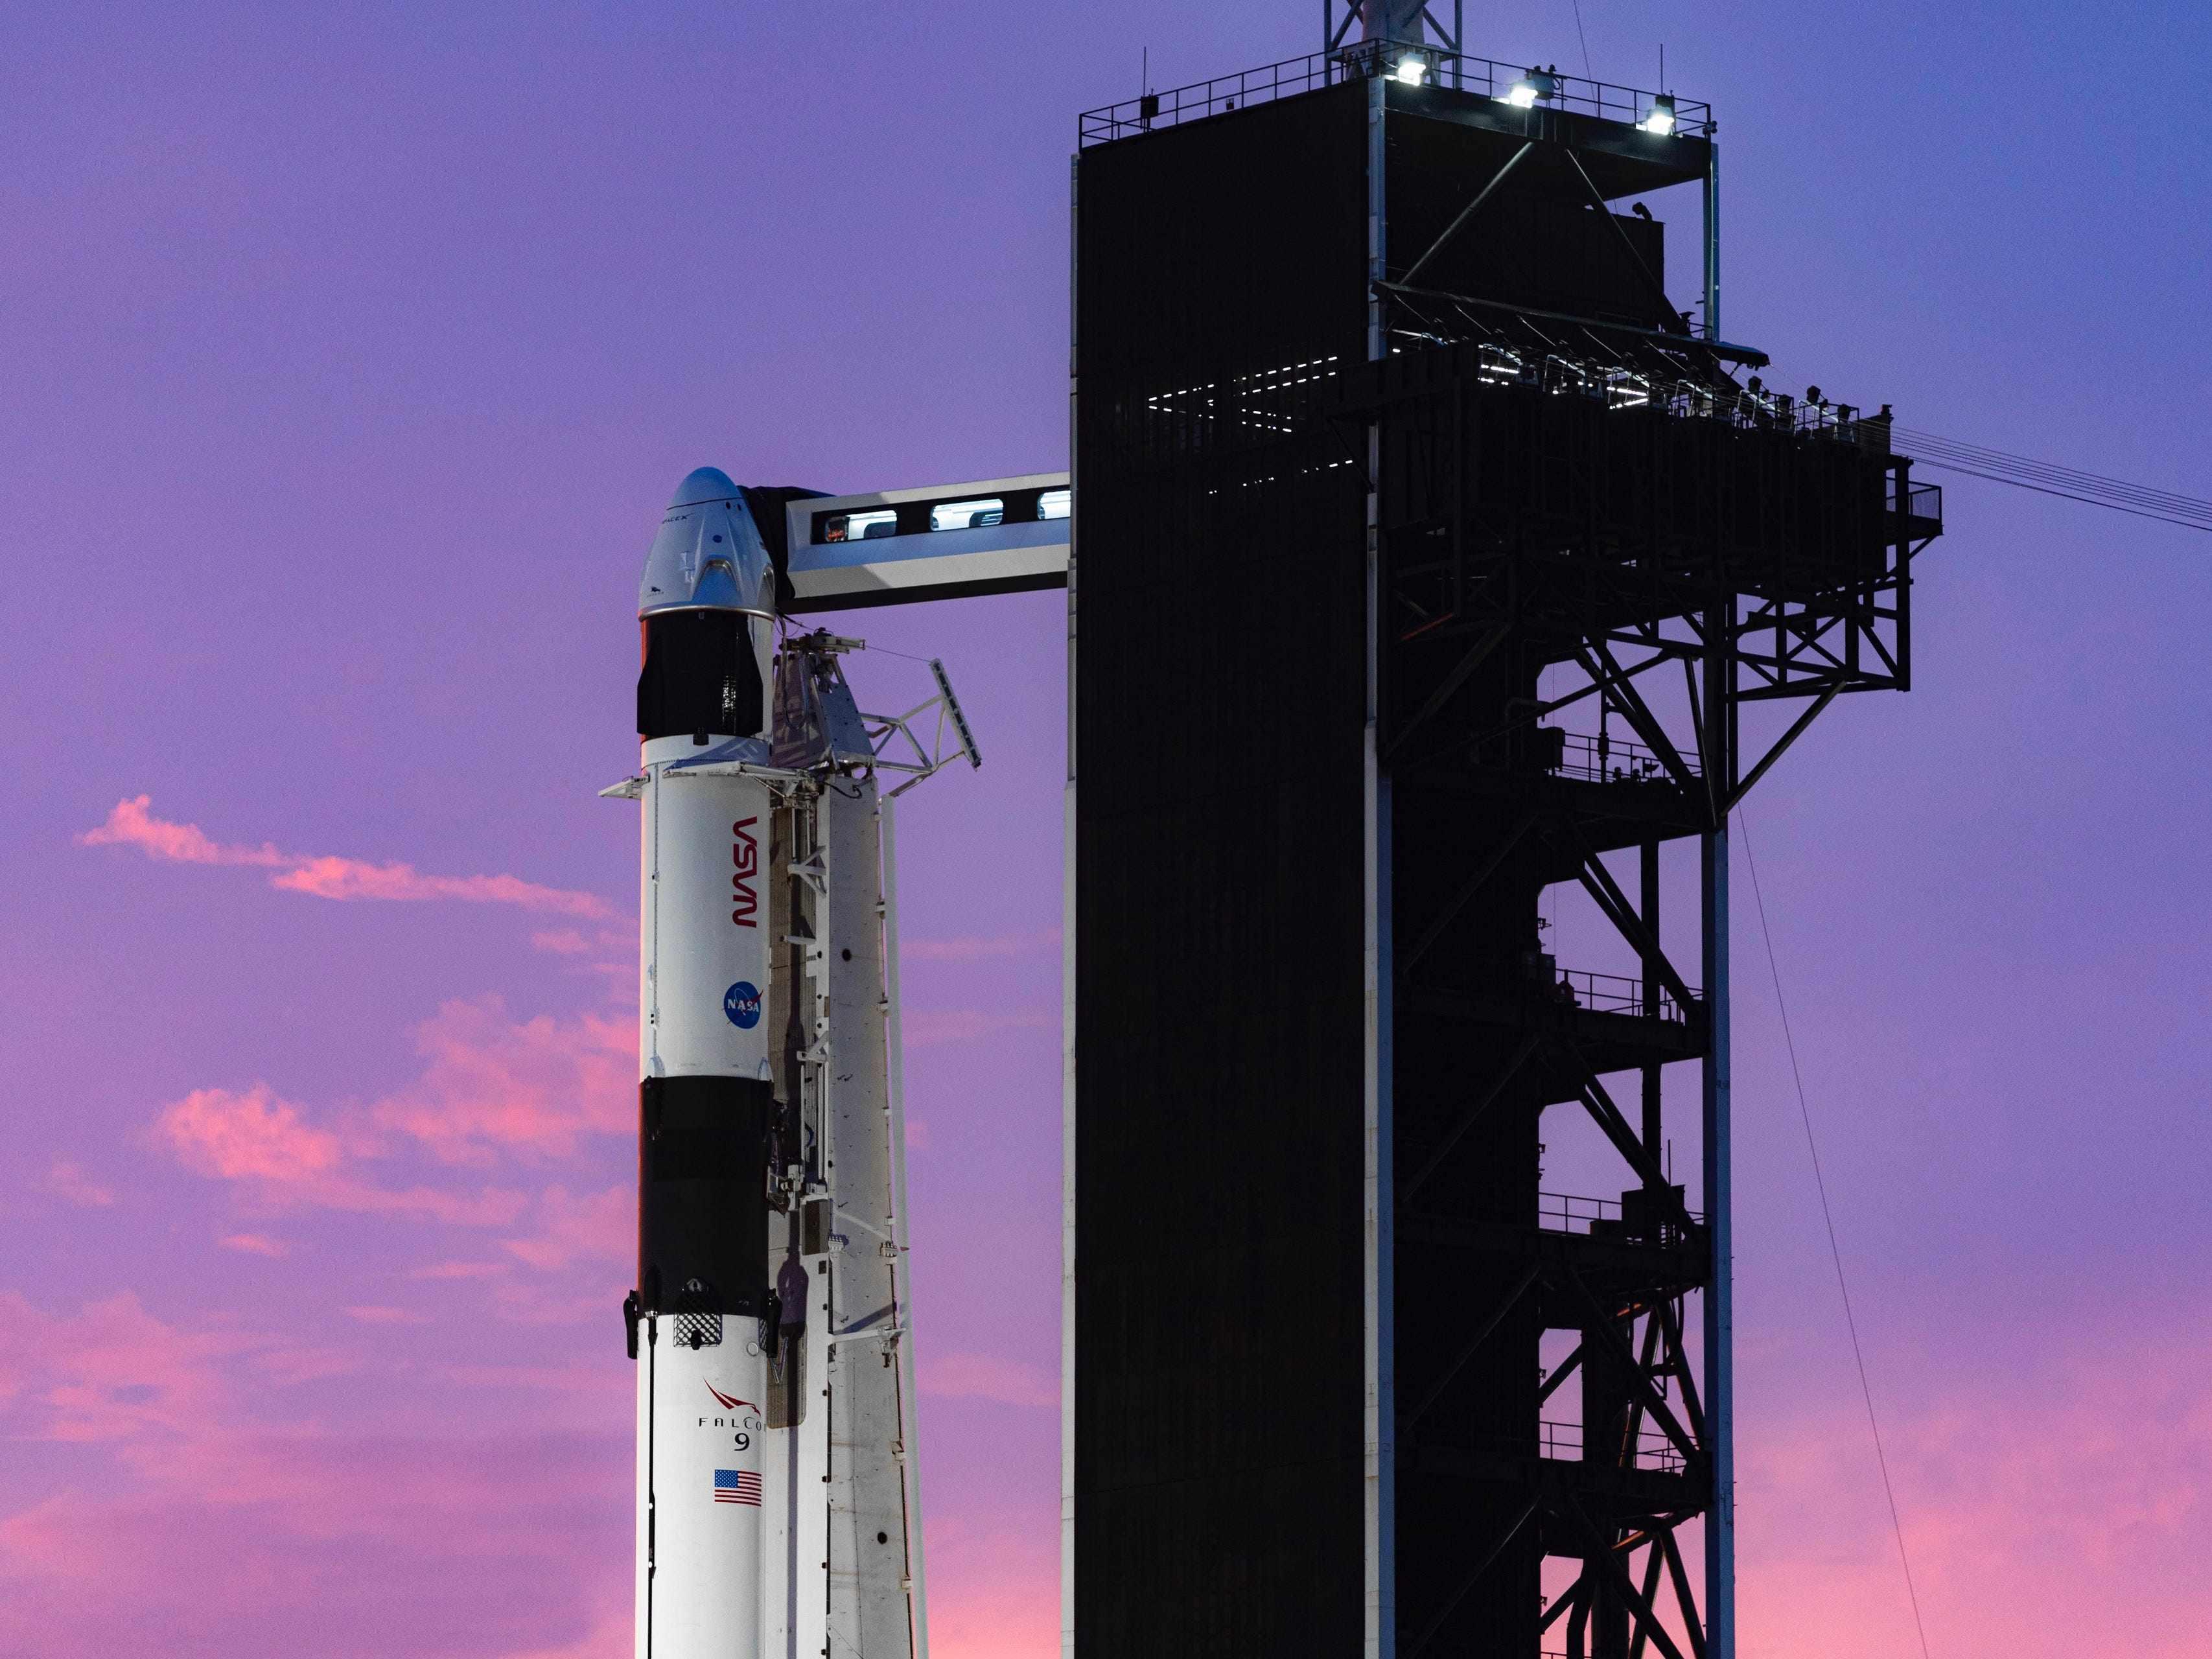 crew spaceship nasa spacex rocket